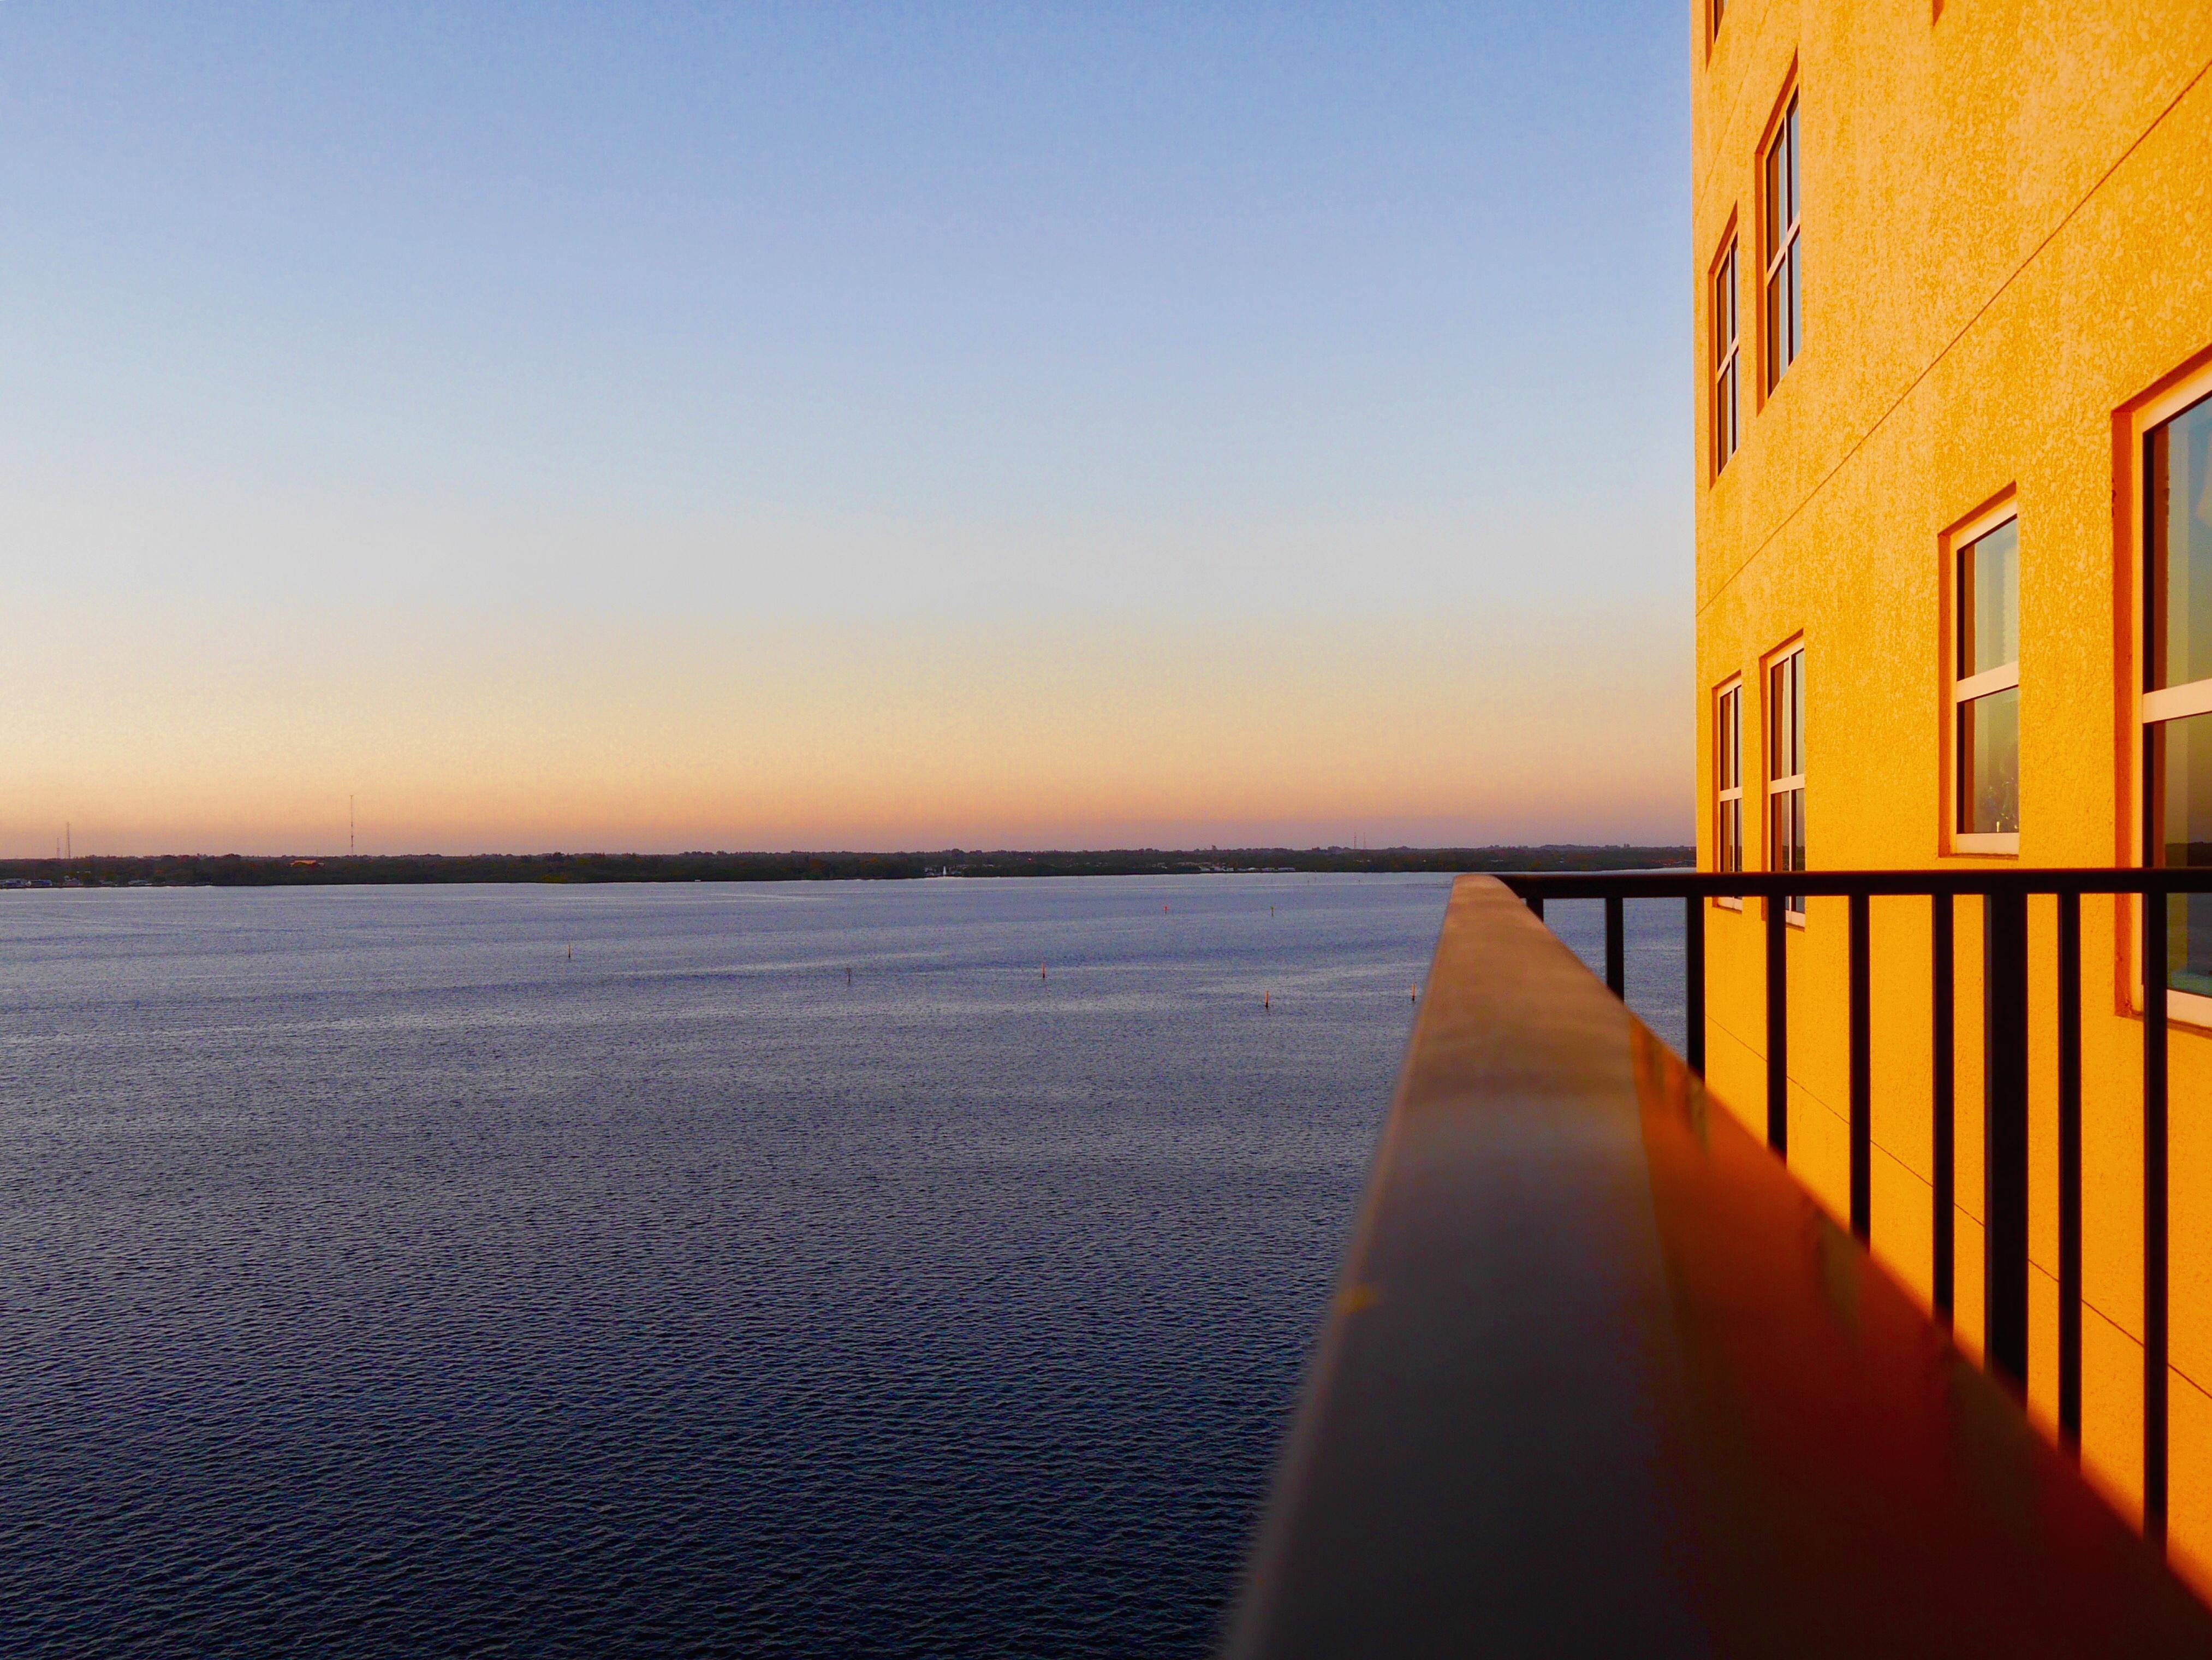 Florida fortmyers sky windows water balcony perspective sunrise